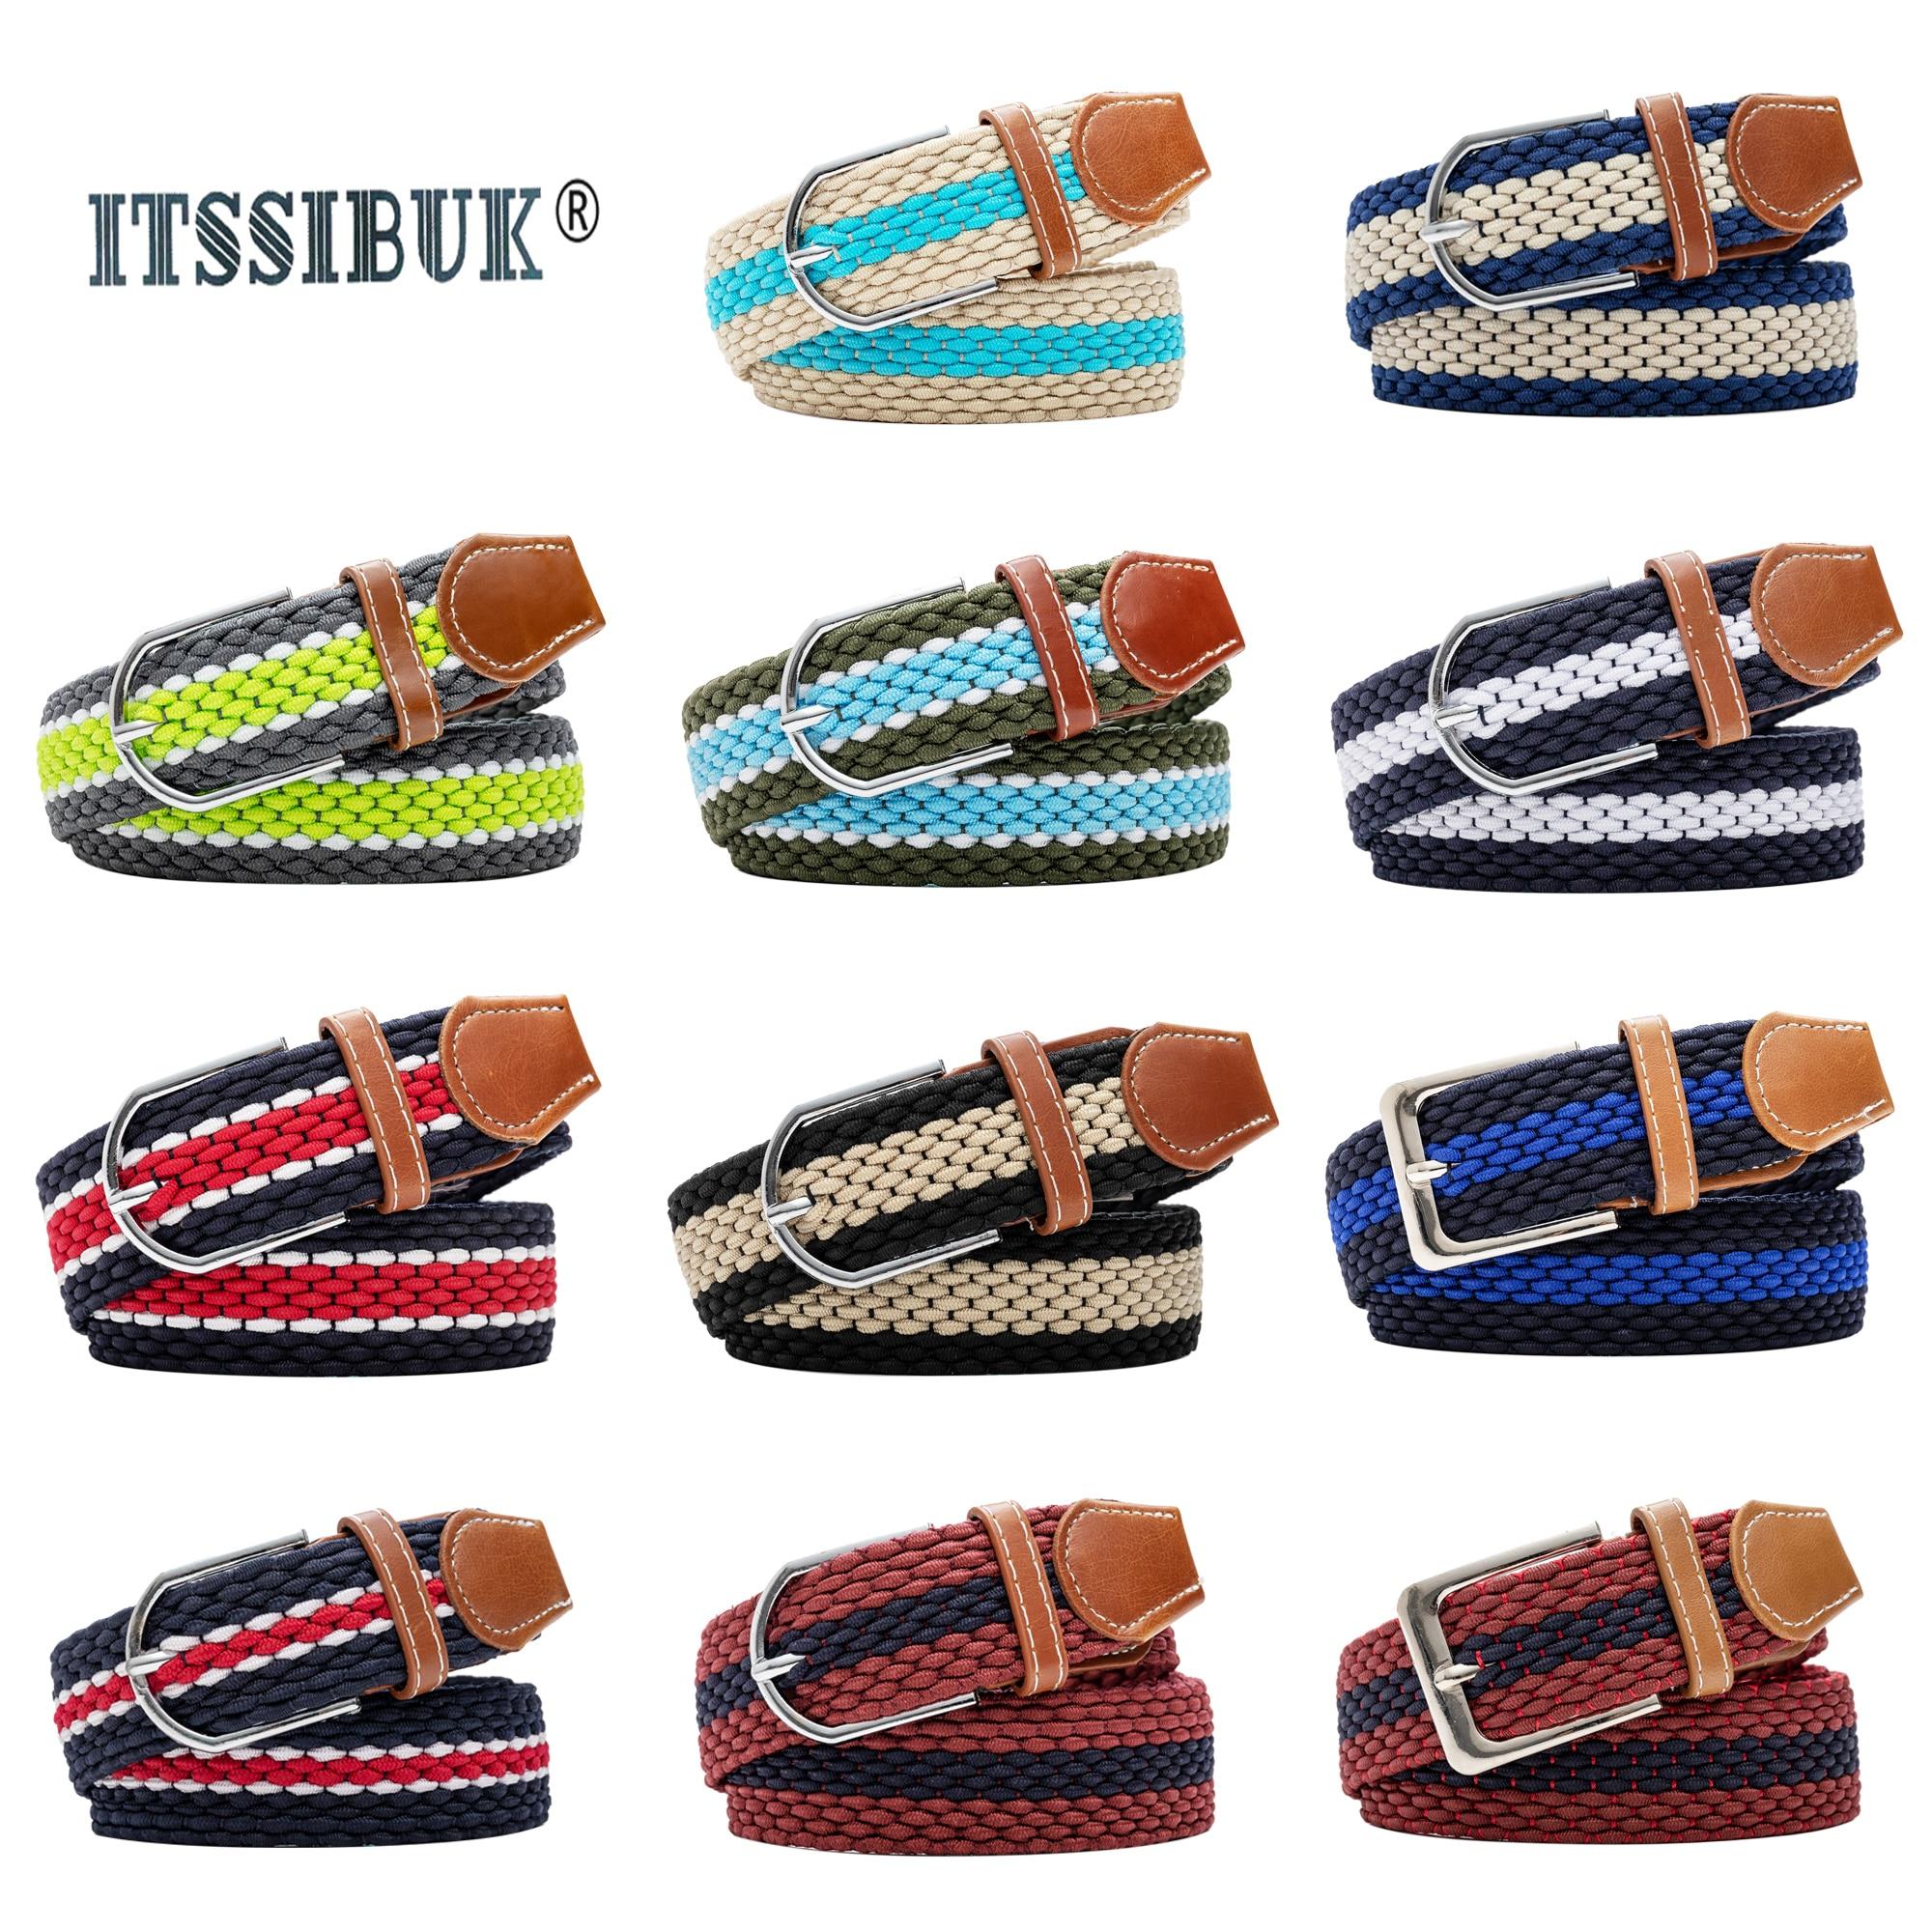 2019 ITSSIBUK Nonporous Elastic Canvas Belt Outdoor Tactical Men&women High Quality Alloy Buckles Belts For Casual Belt105-110cm